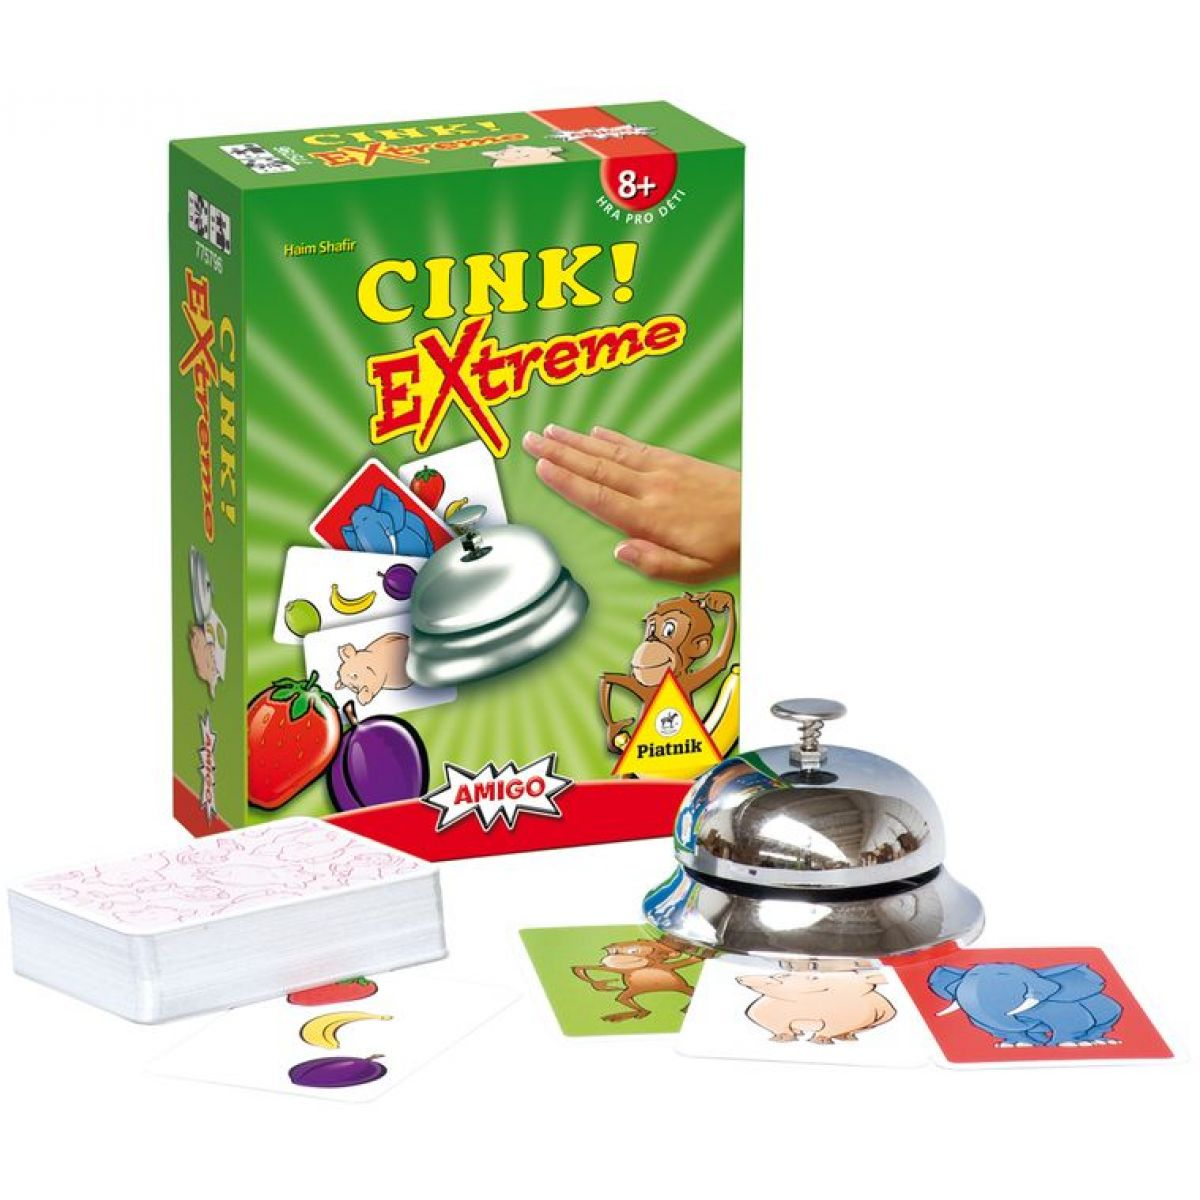 Piatnik Cink Extreme!